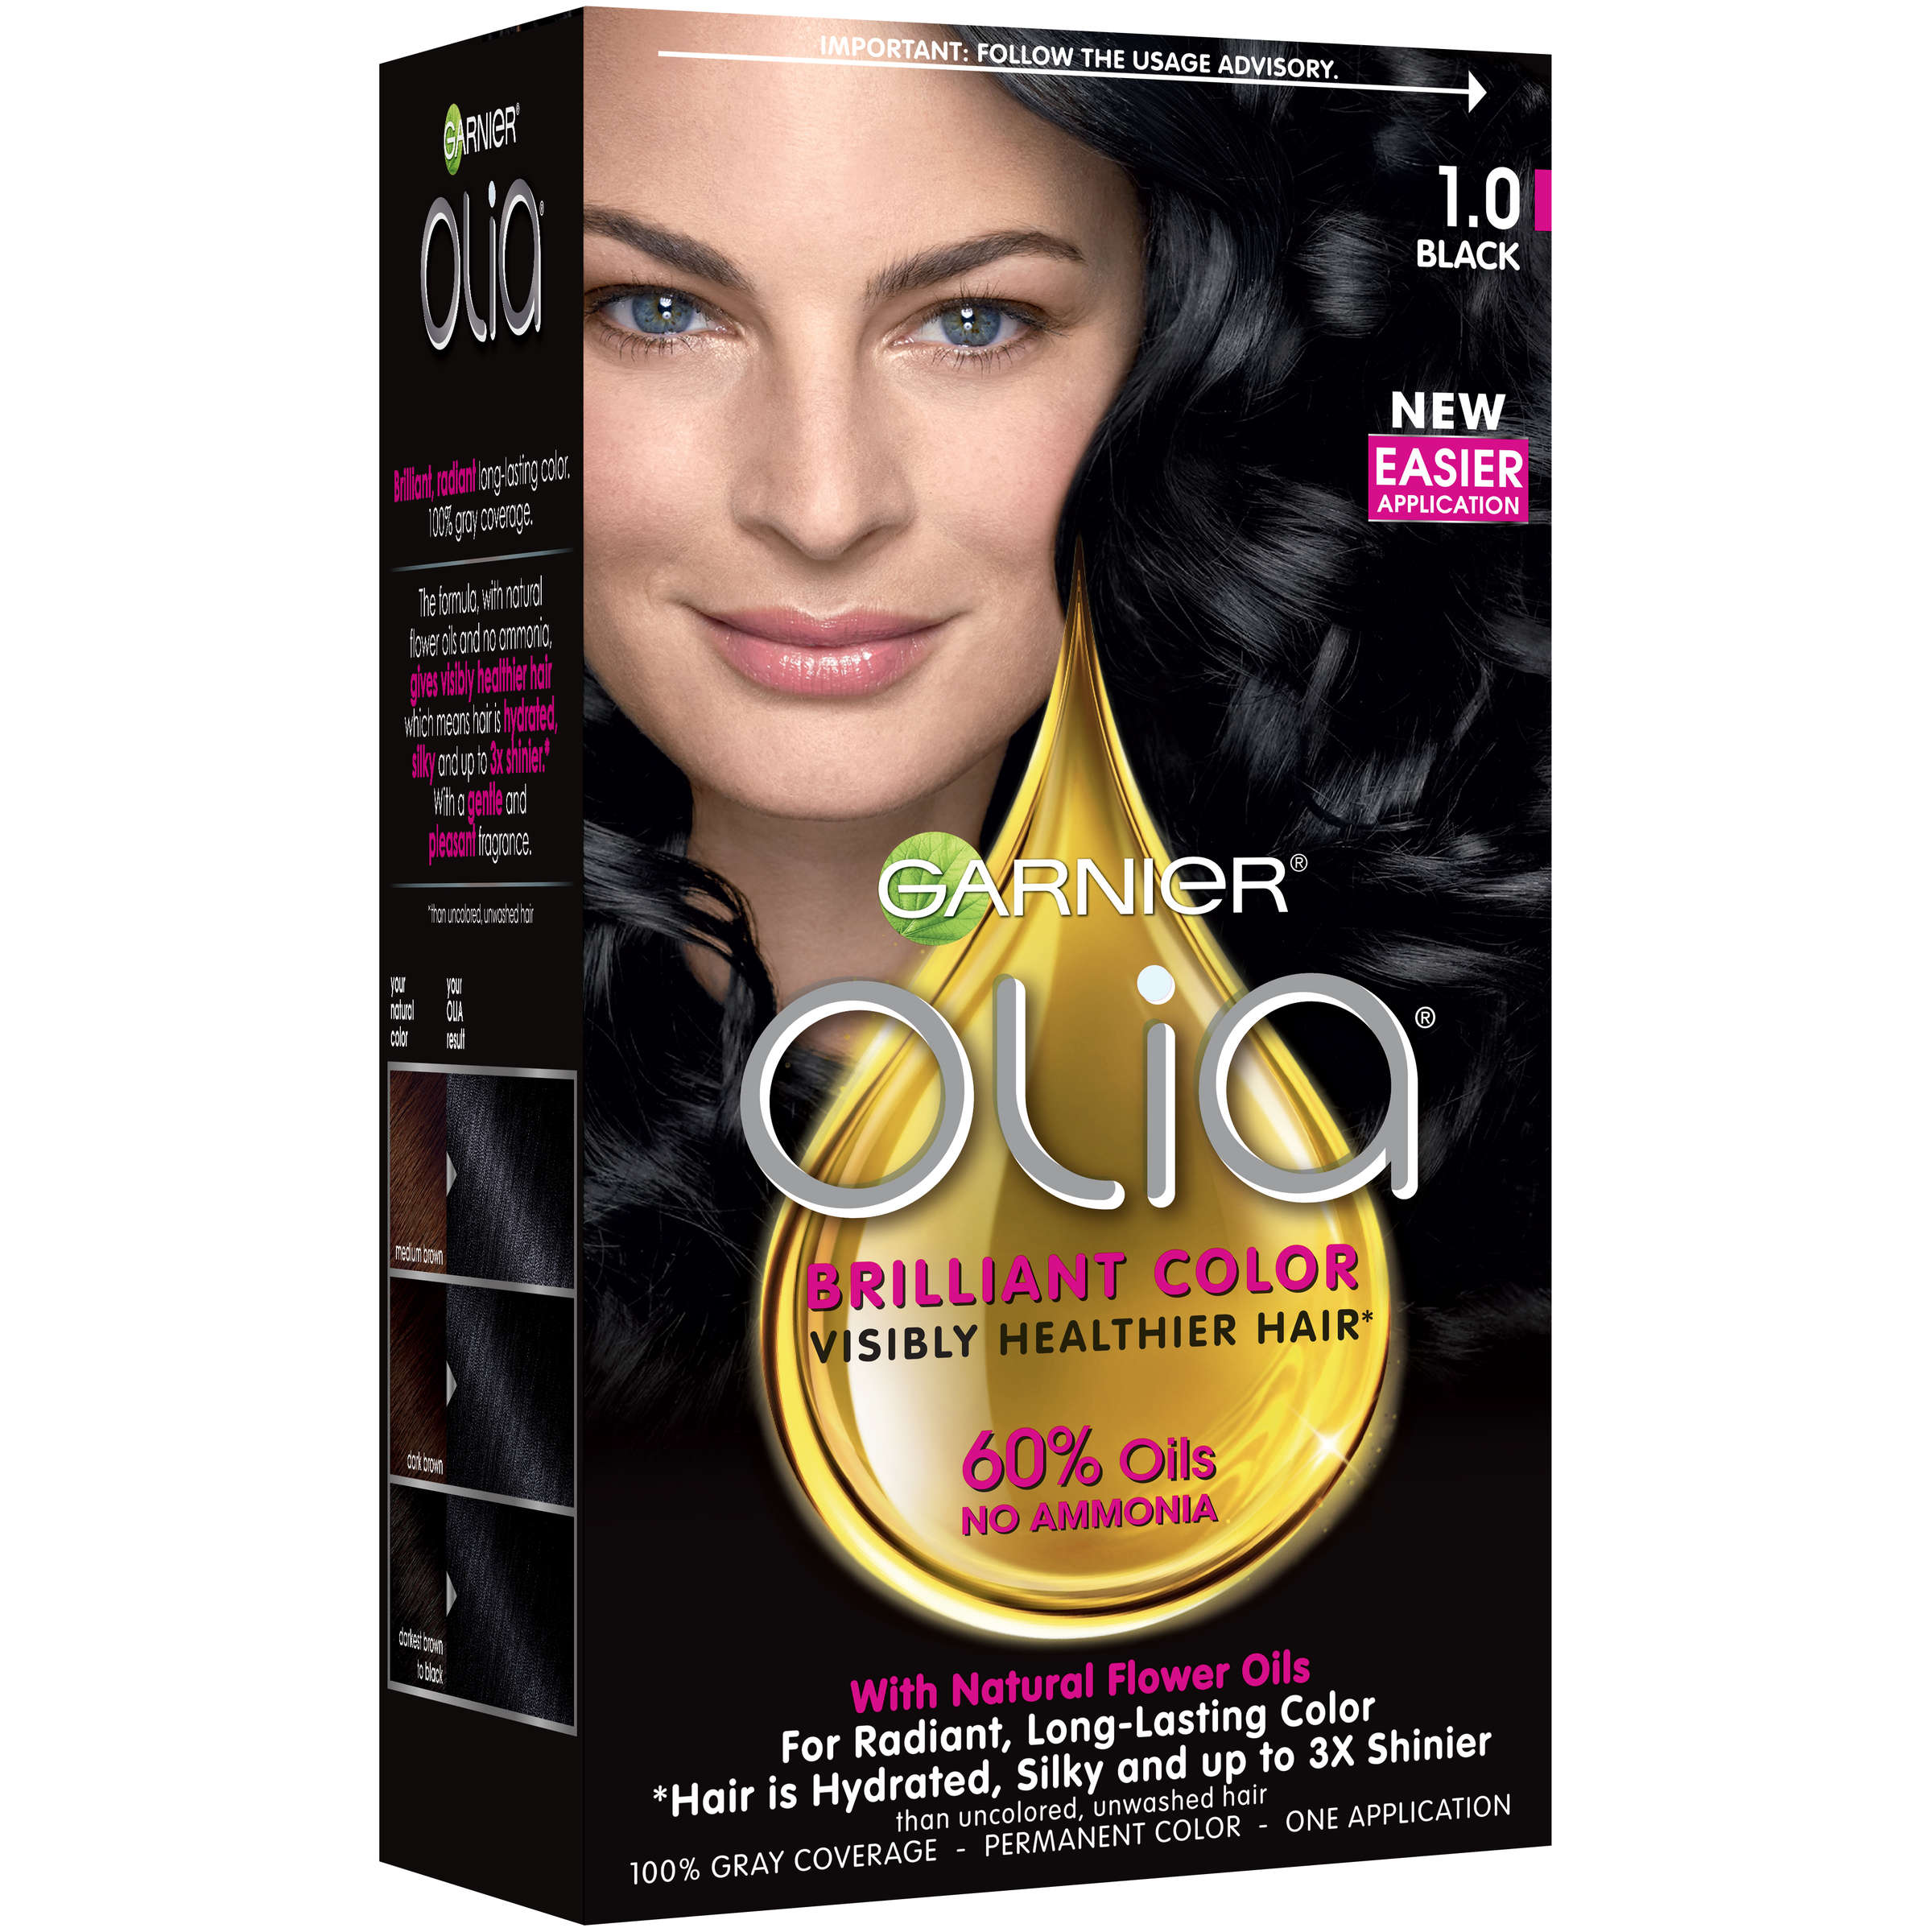 Garnier Olia Oil Powered Permanent Hair Color 211 Platinum Black